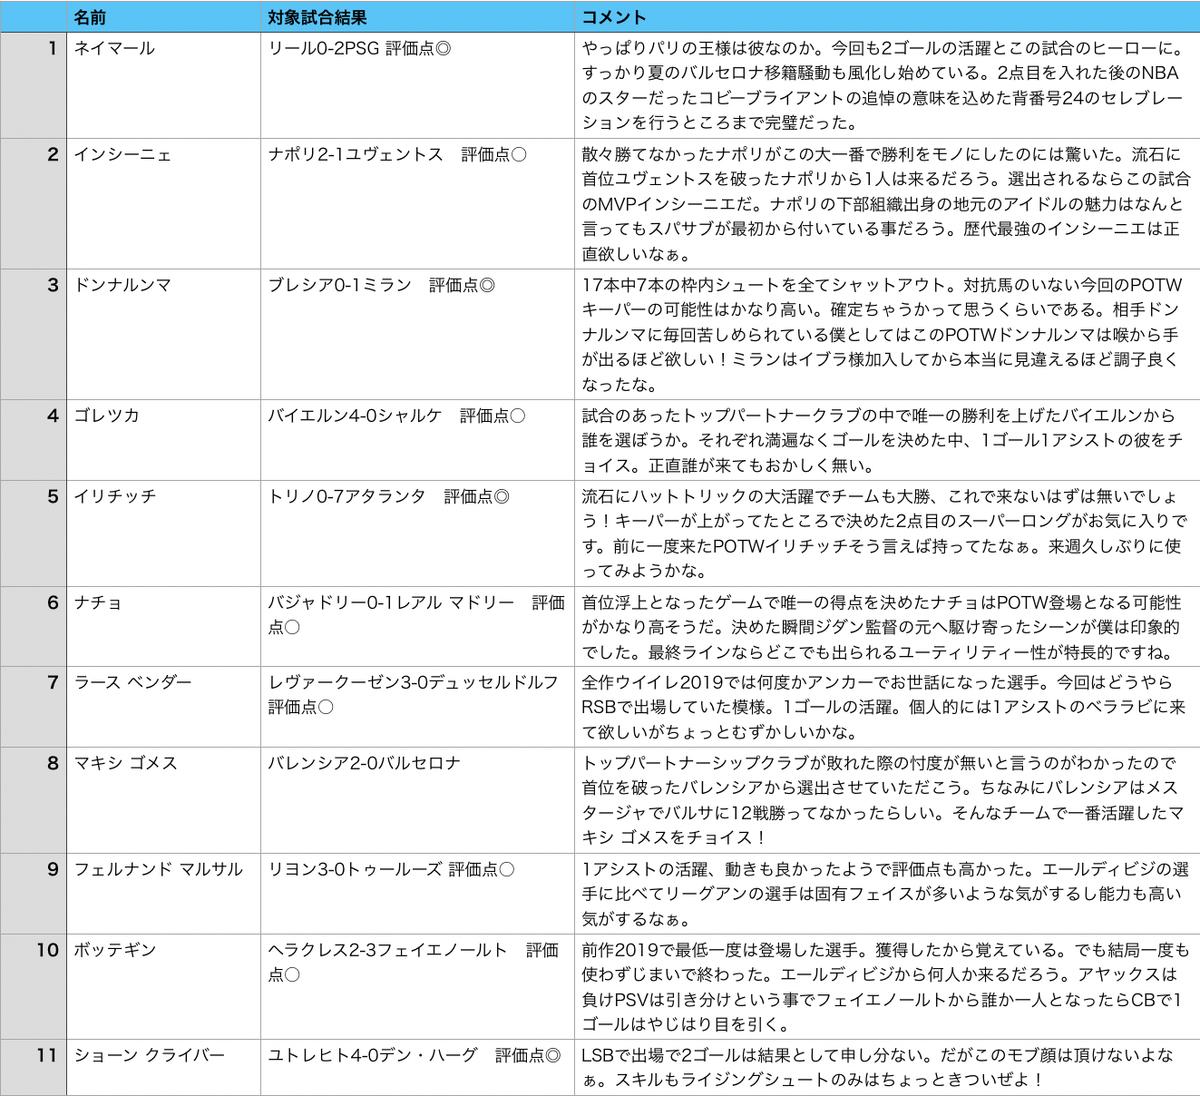 f:id:bokukantoku:20200201162348j:plain